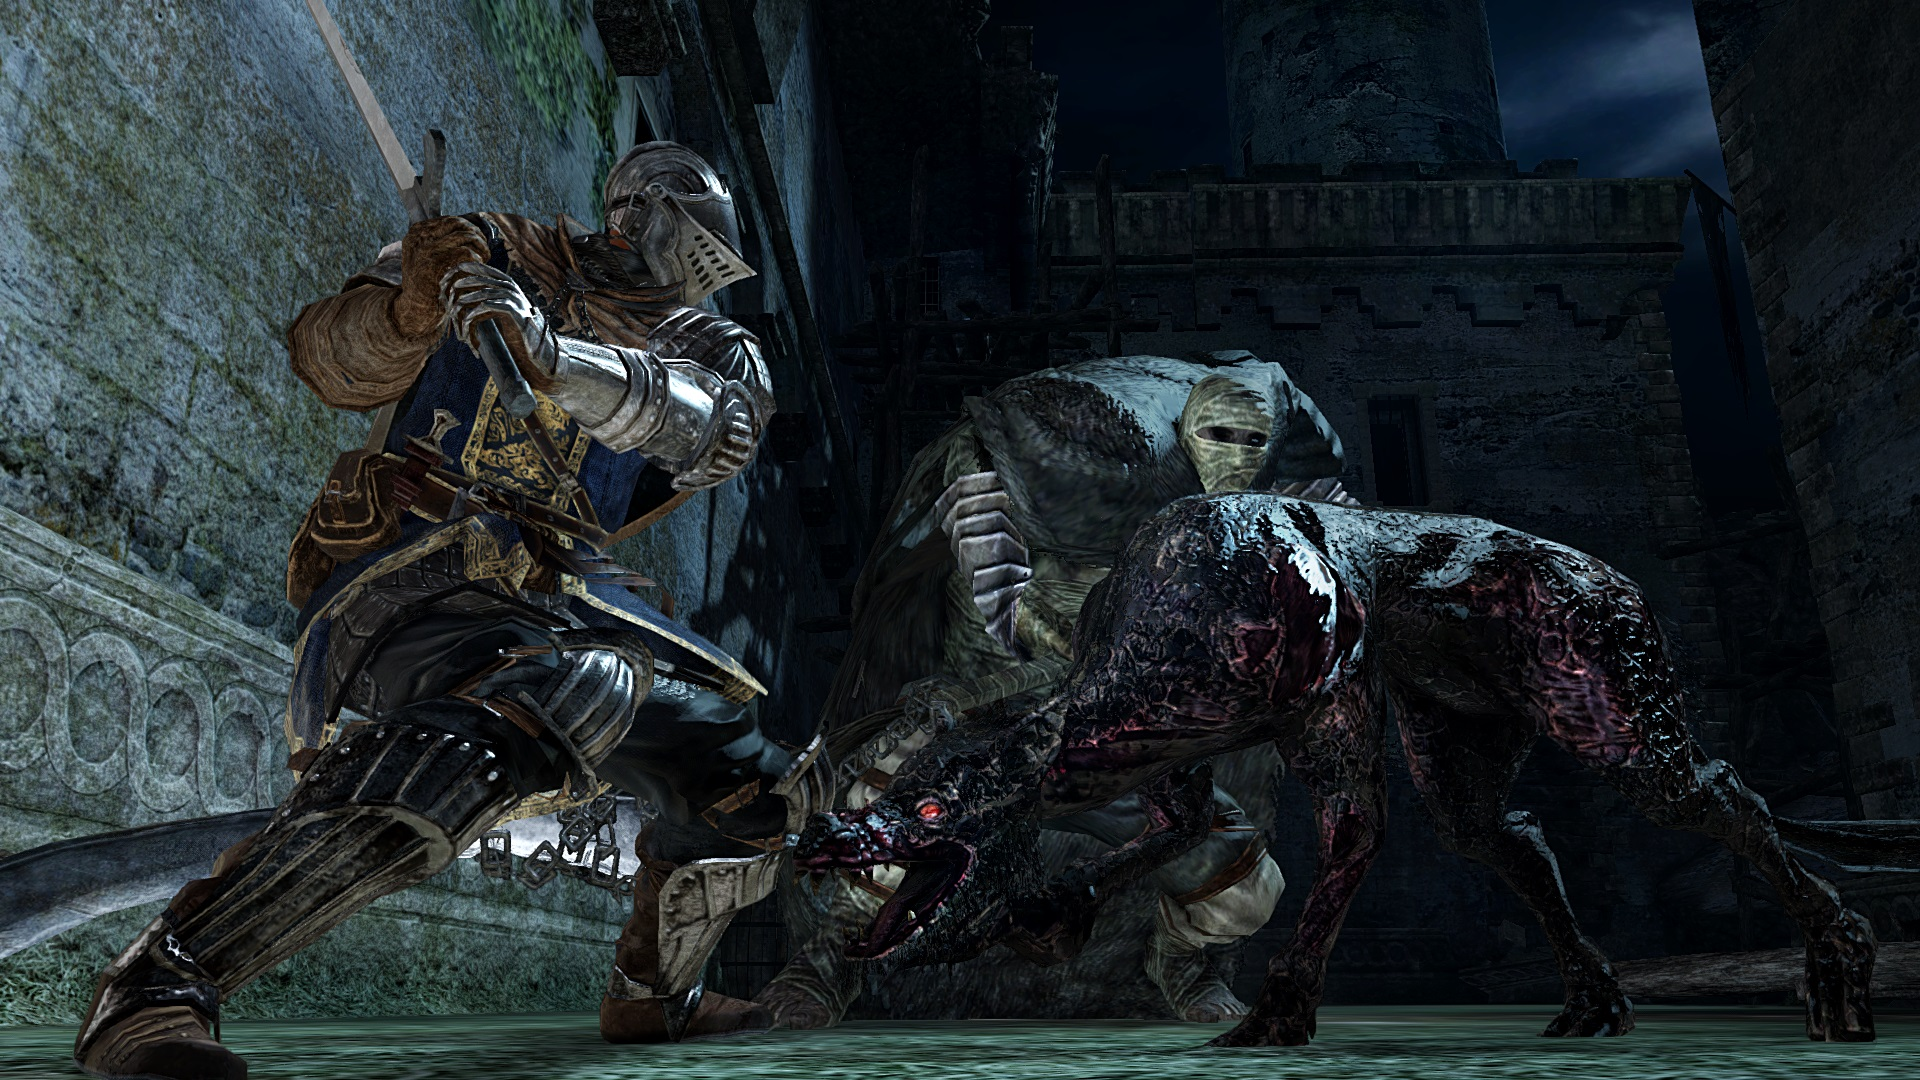 dark souls ii game wallpapers